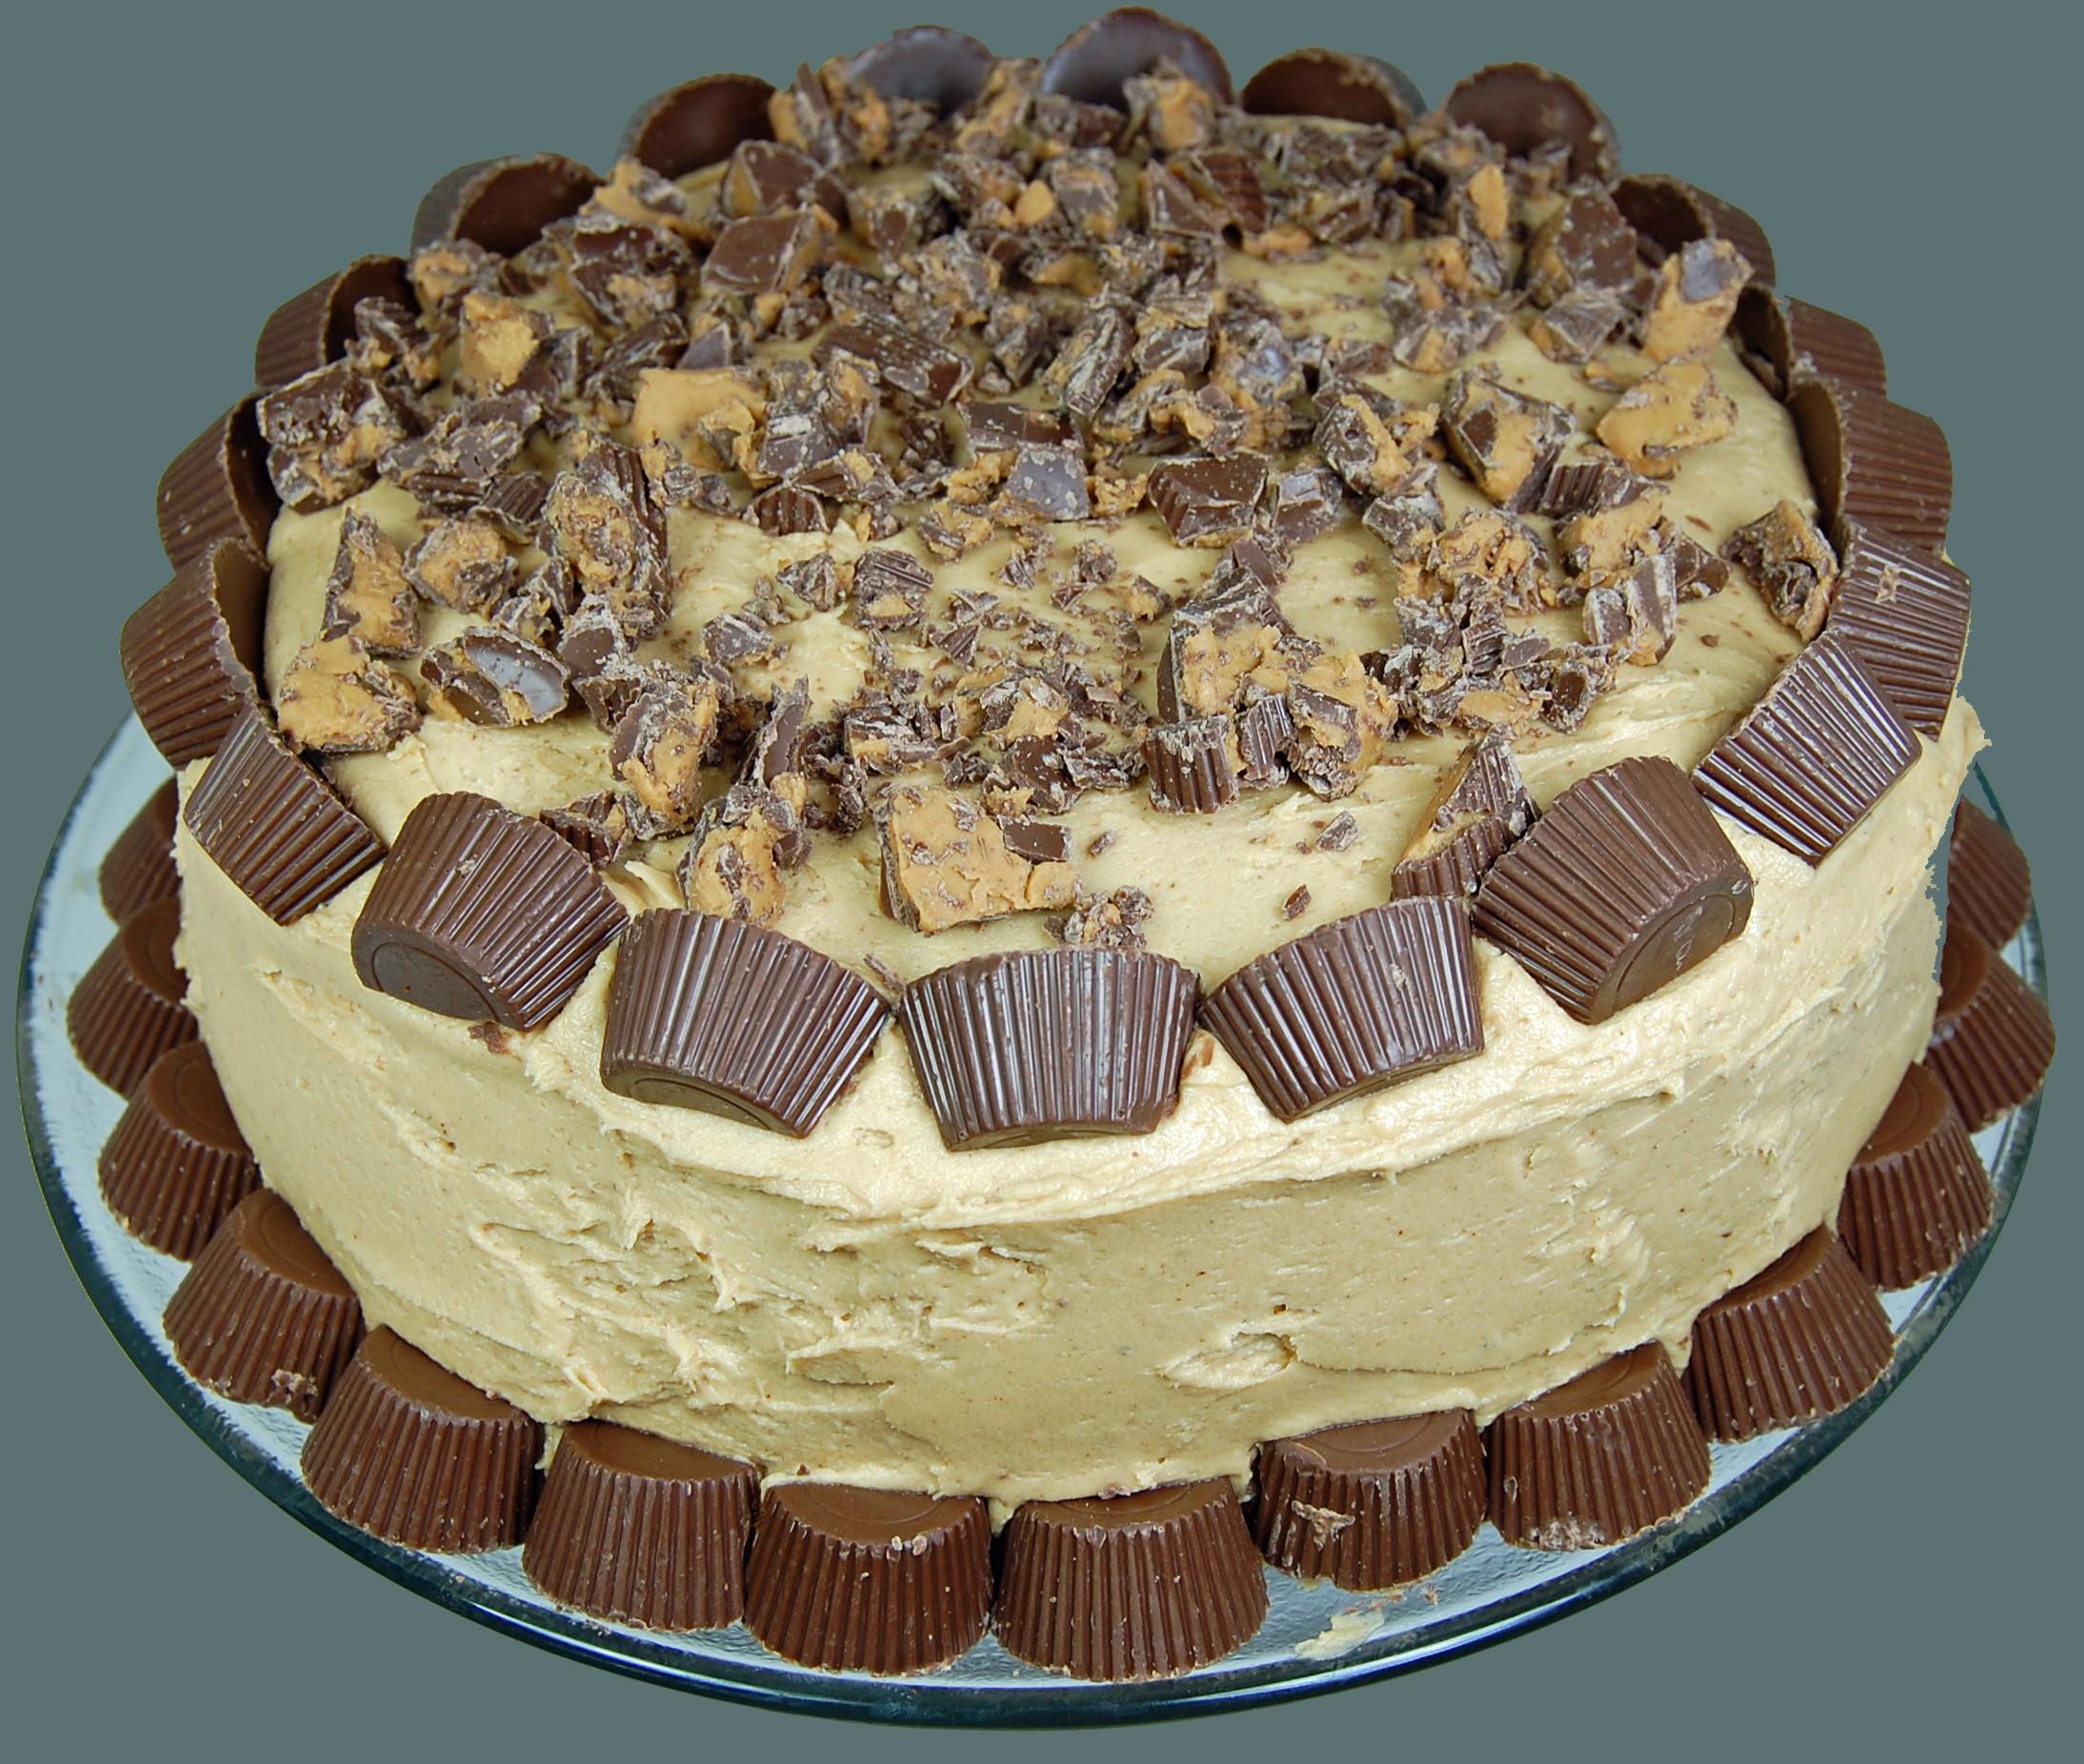 Peanut Butter Cake Recipe  Chocolate Peanut Butter Cake